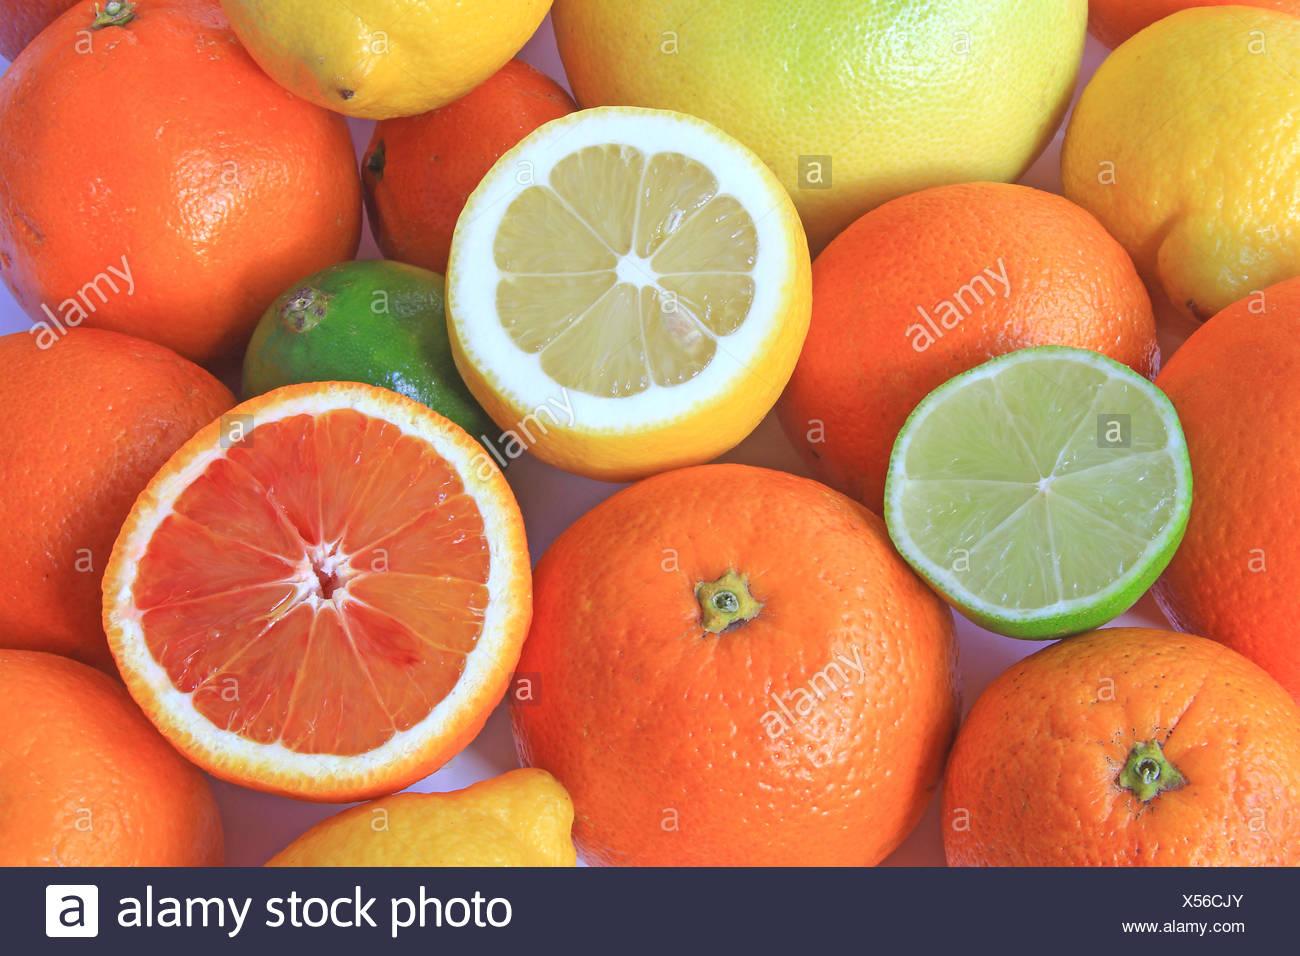 Various citrus fruits - Stock Image